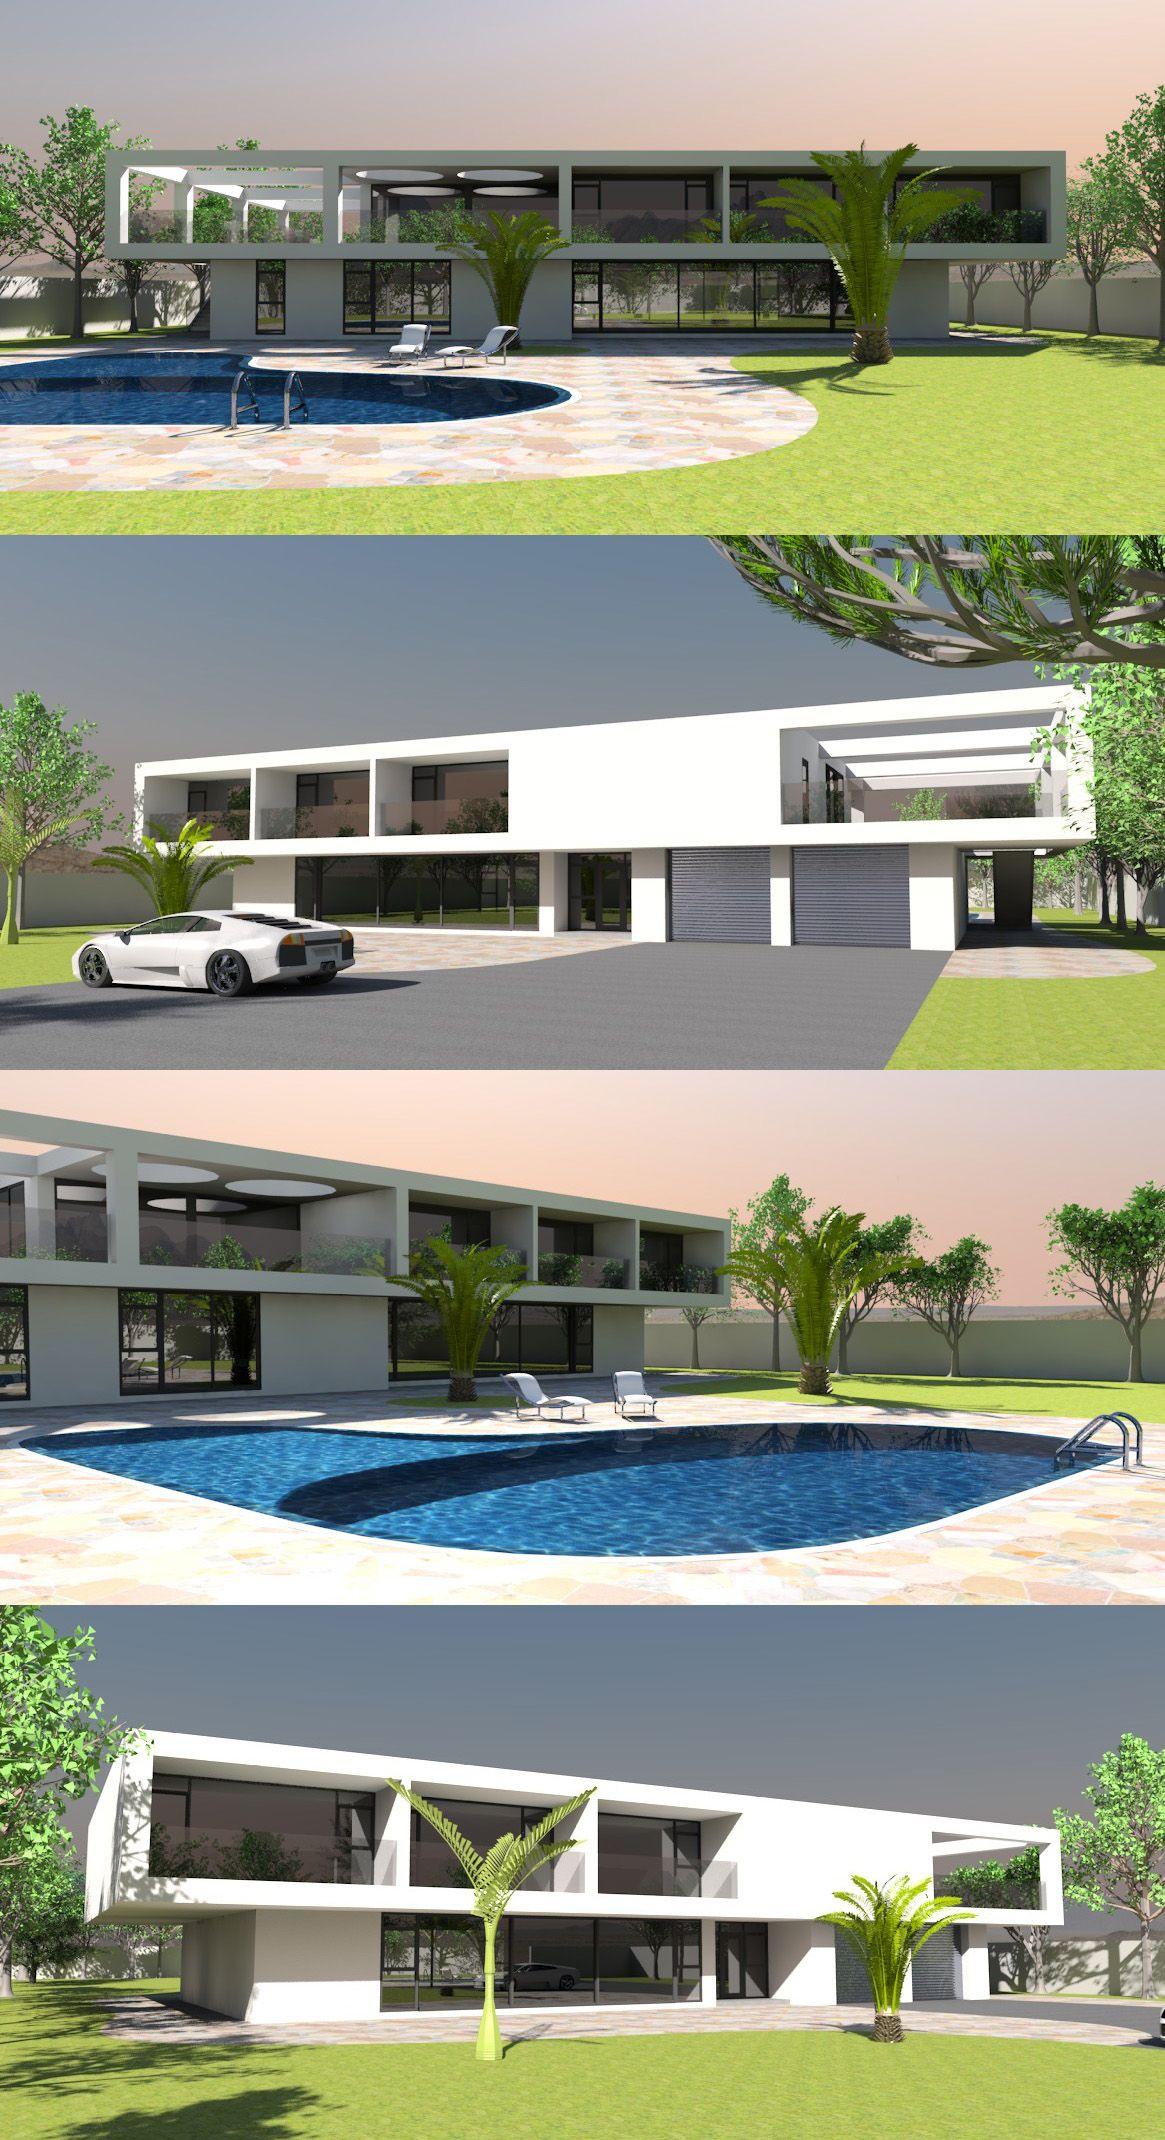 Modern Guard House Design: Elegant 6 Bed / Bath Contemporary